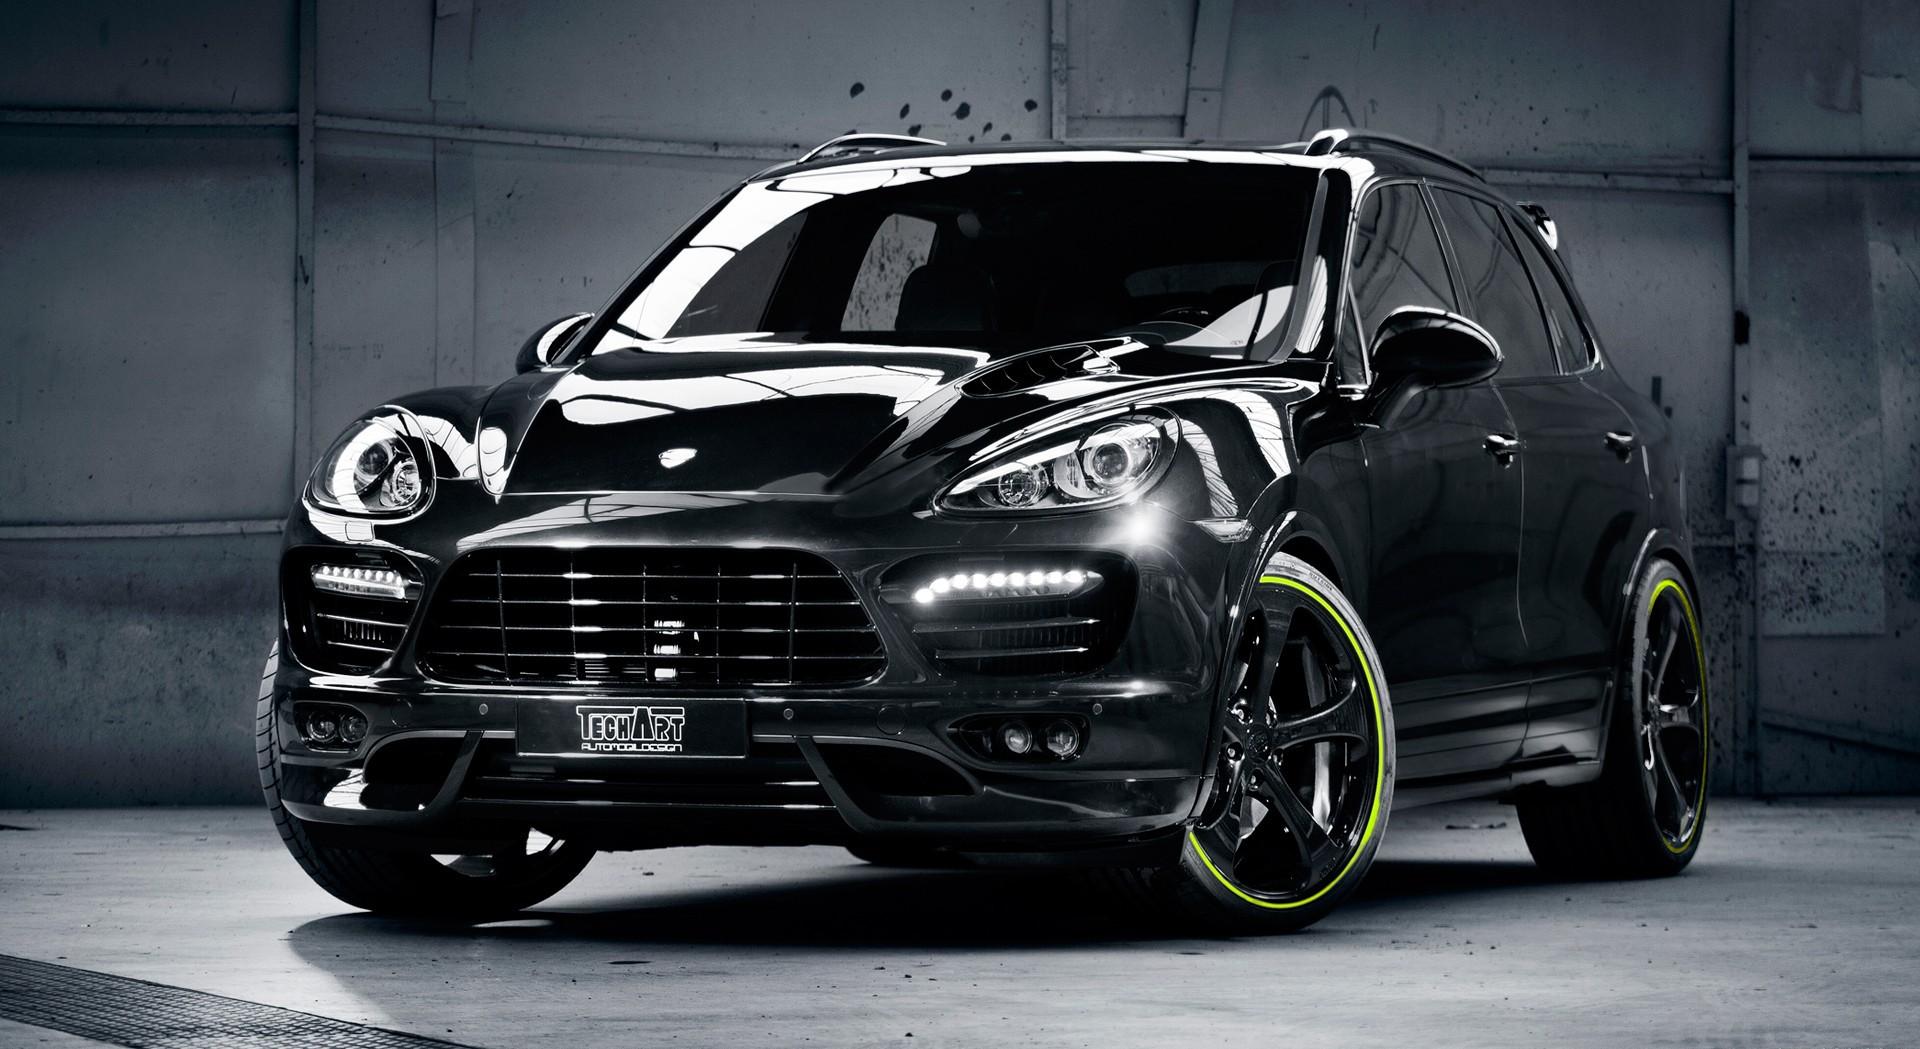 Porsche Cayenne S Black Hd Desktop Wallpapers 4k Hd